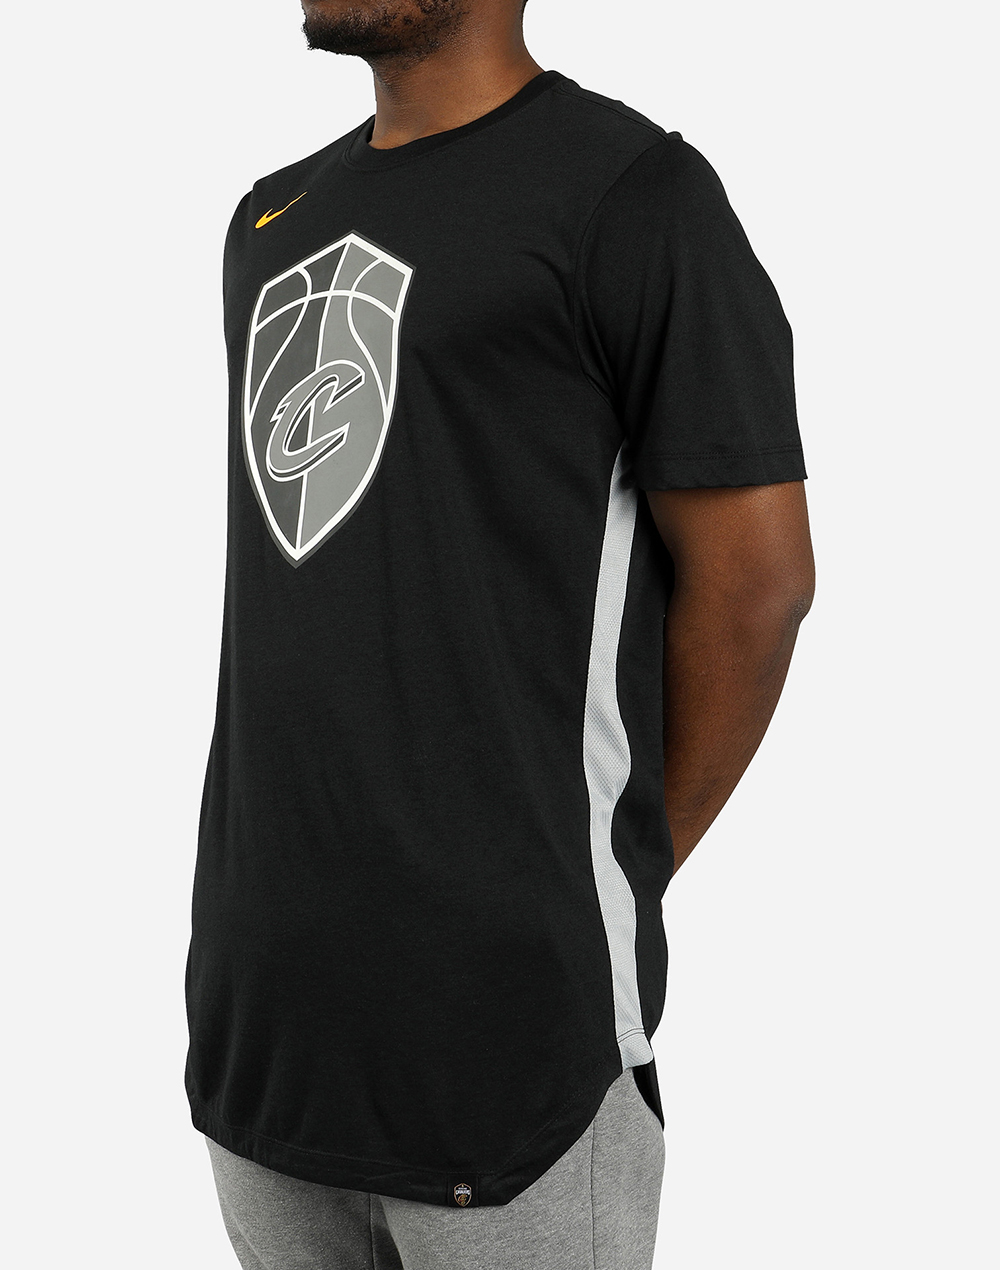 66caed7cfa4f Nike NBA Cleveland Cavaliers City Edition Dri-Fit Tee - NBA Shop ...